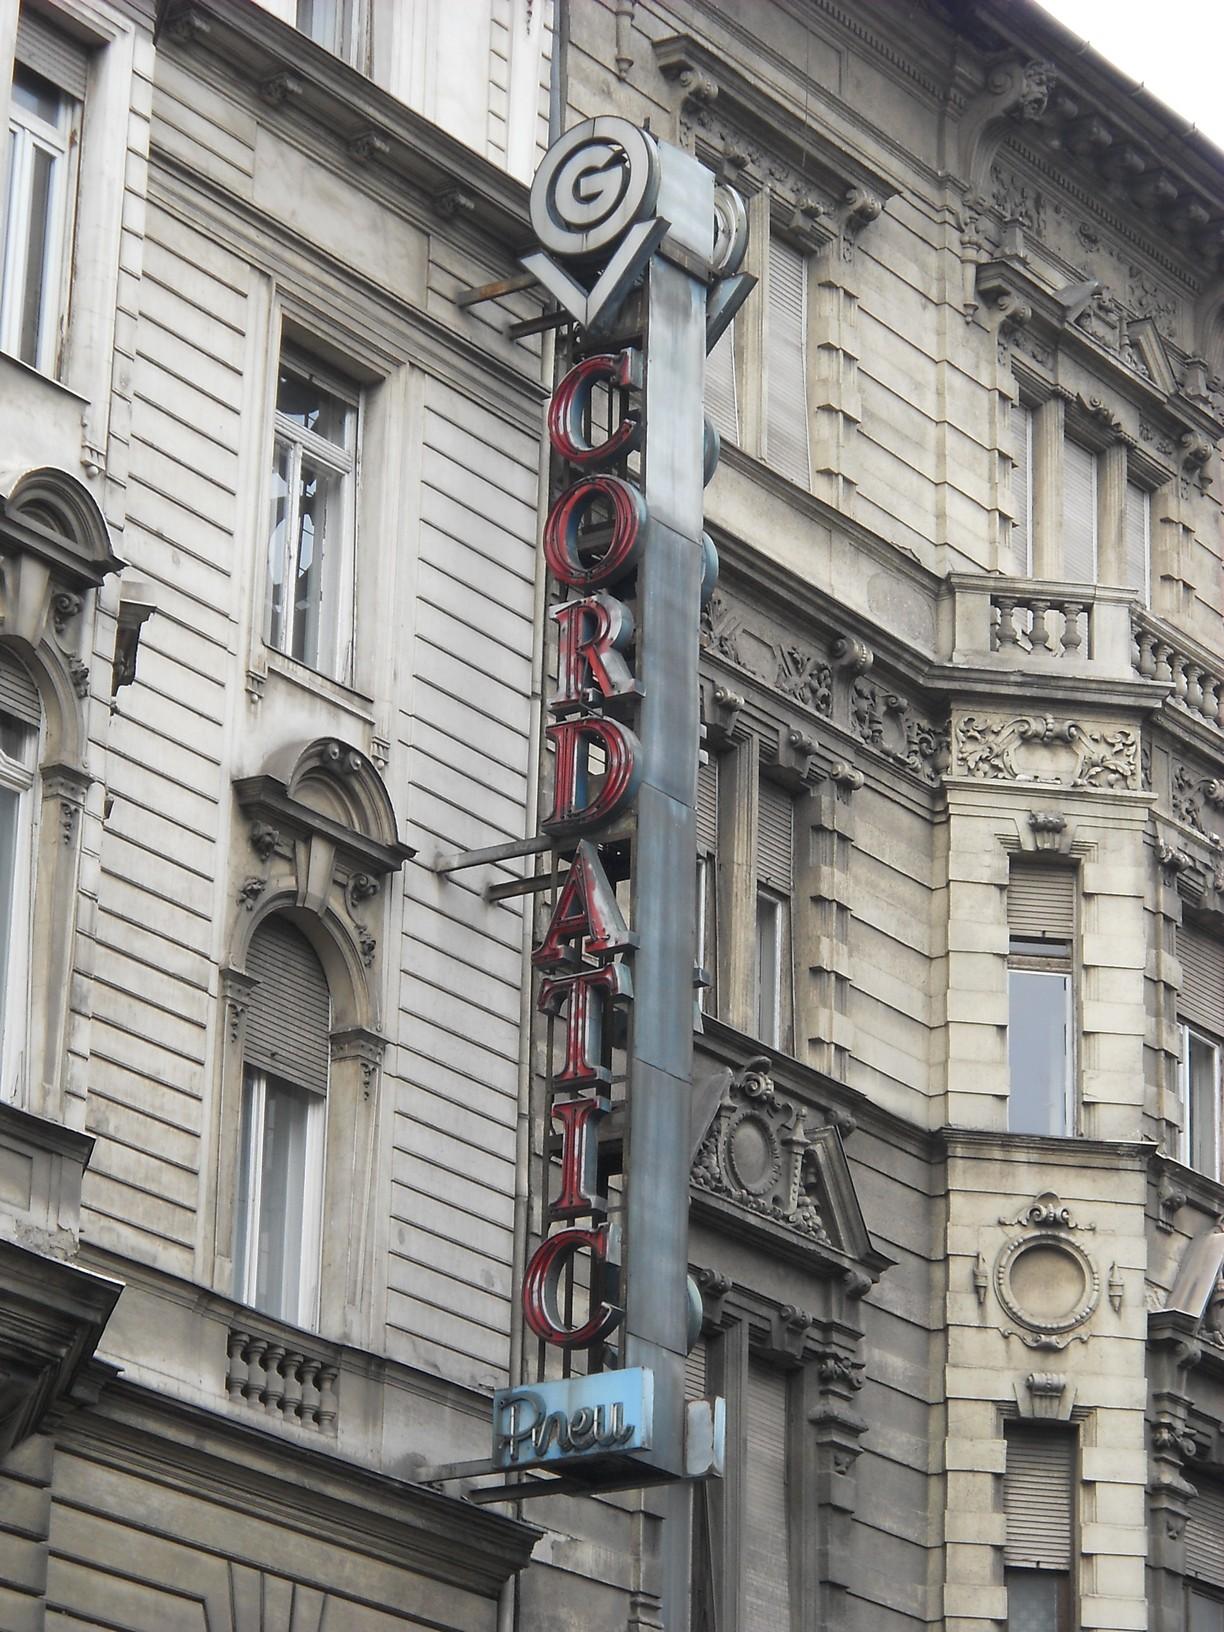 V., Kossuth Lajos utca